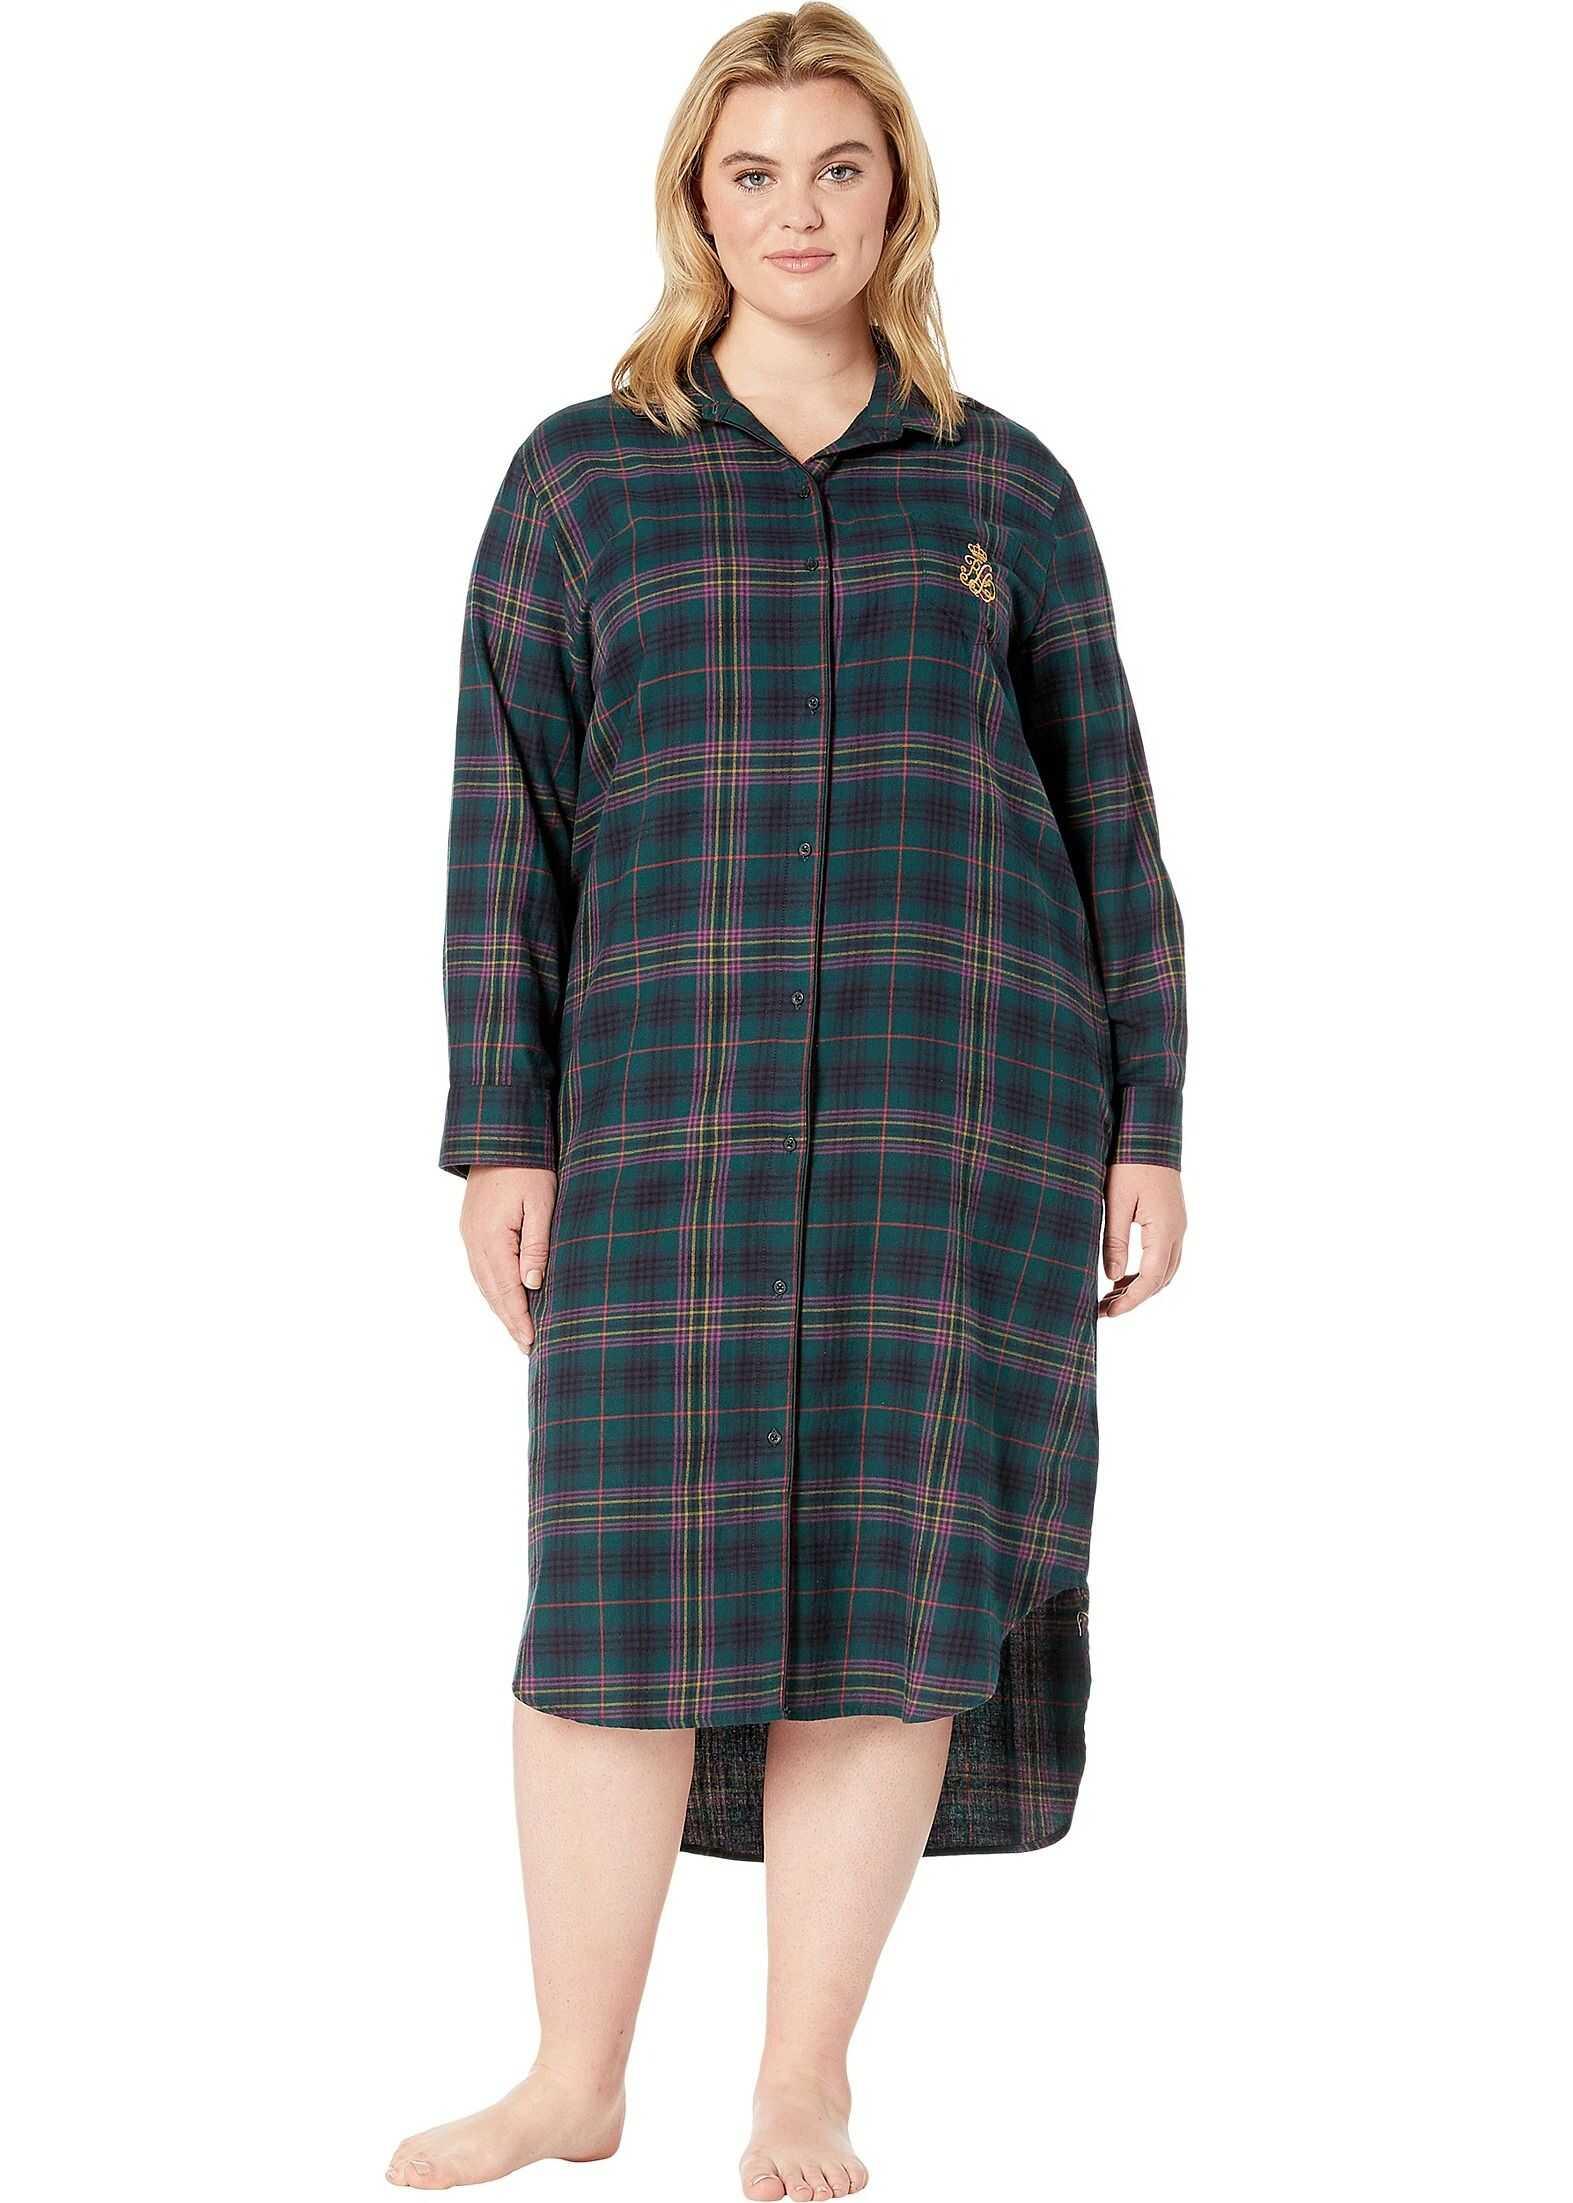 Ralph Lauren Plus Size Brushed Twill Long Sleeve Rounded Notch Collar Ballet Sleepshirt Green Plaid